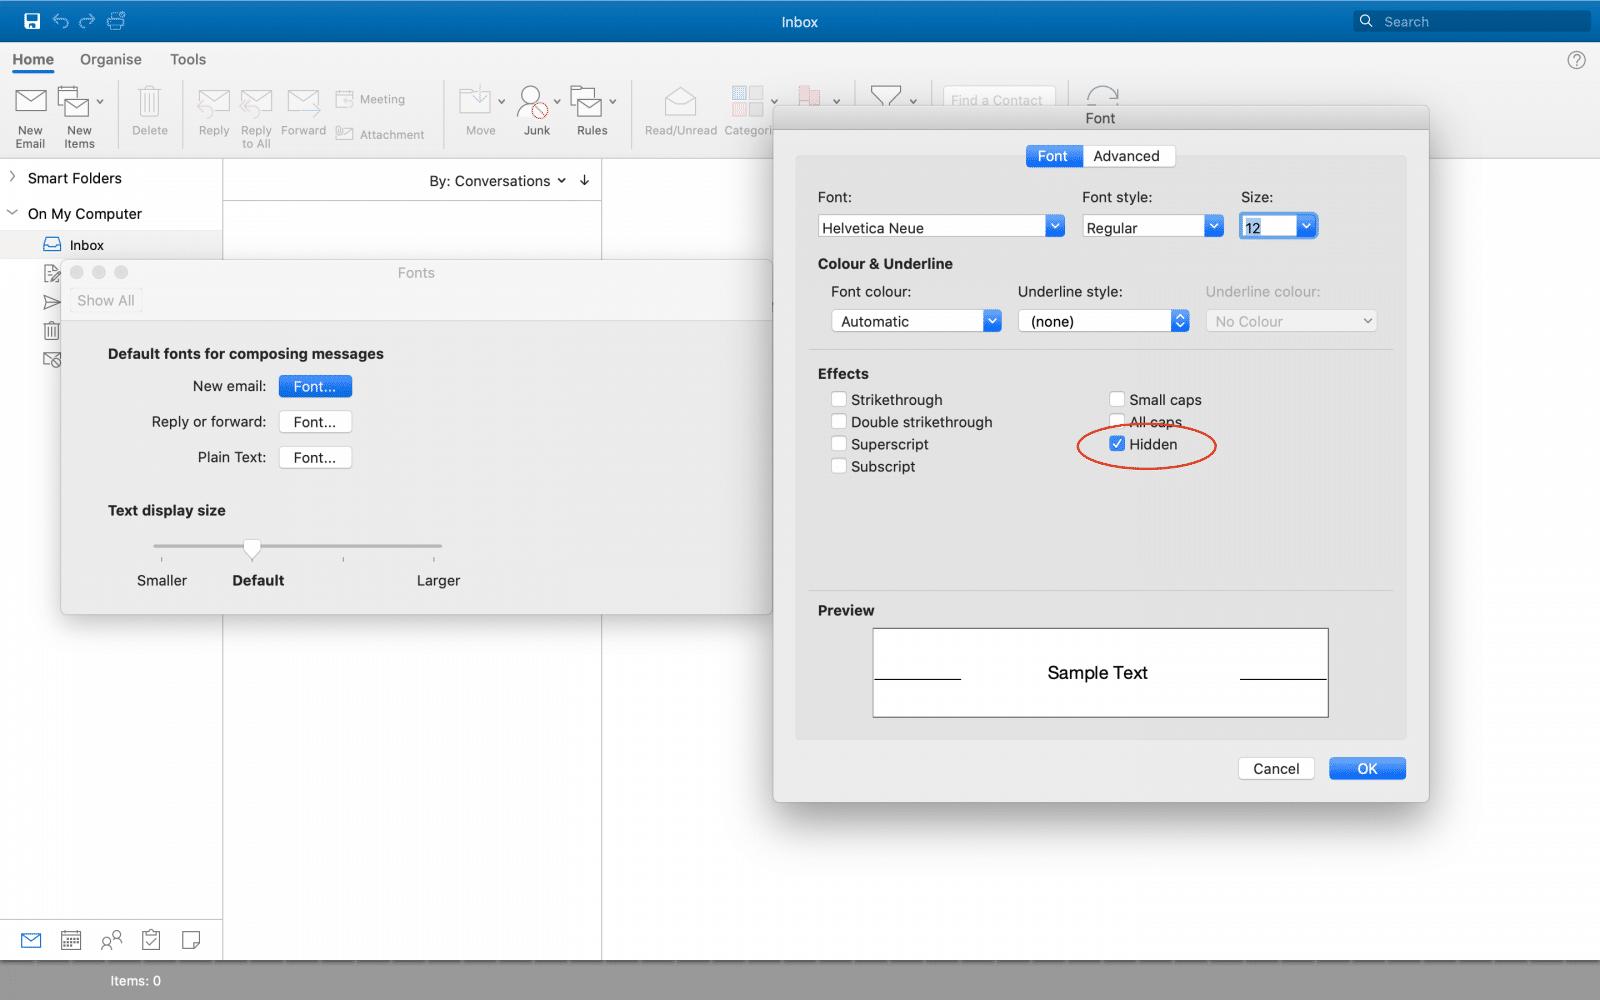 Outlook 2019 Mac Default Font Editor Remove Hidden Formatting Marks